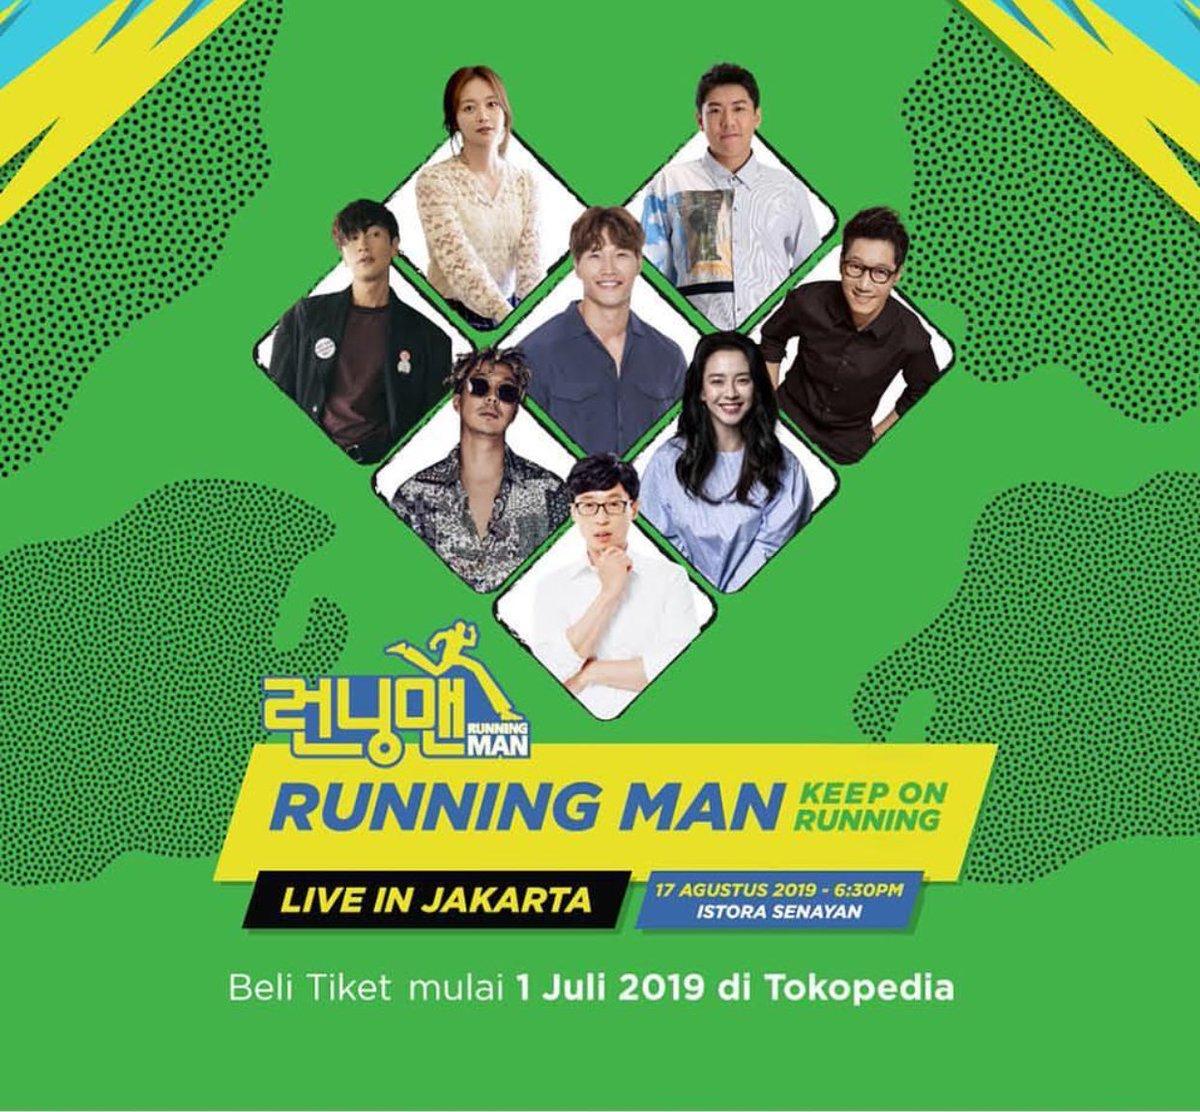 SBS Running Man 런닝맨 (@RunningManGuest) | Twitter